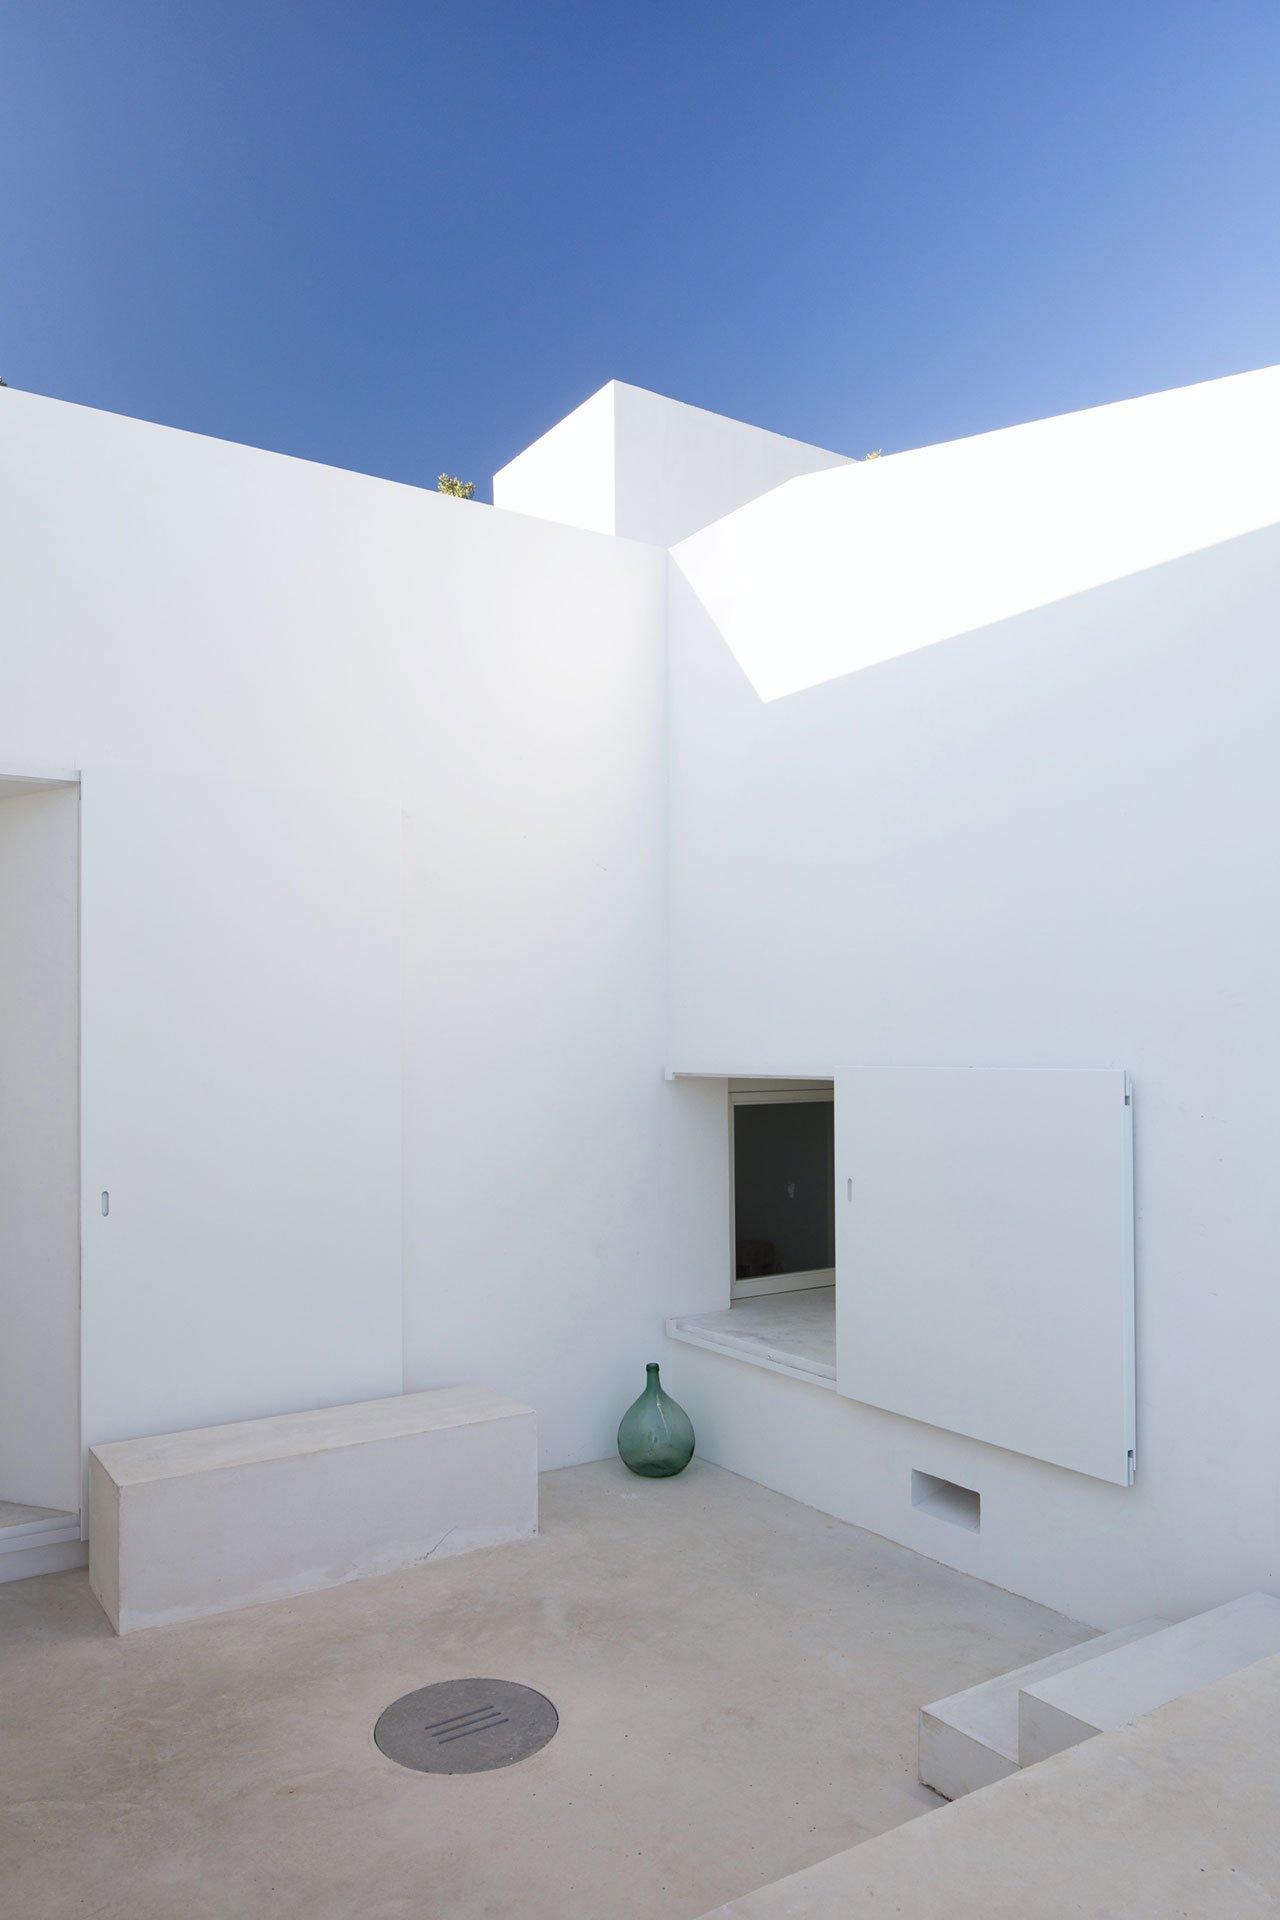 casa-luum-minimalizmus-a-portugal-videken-noko-020.jpg